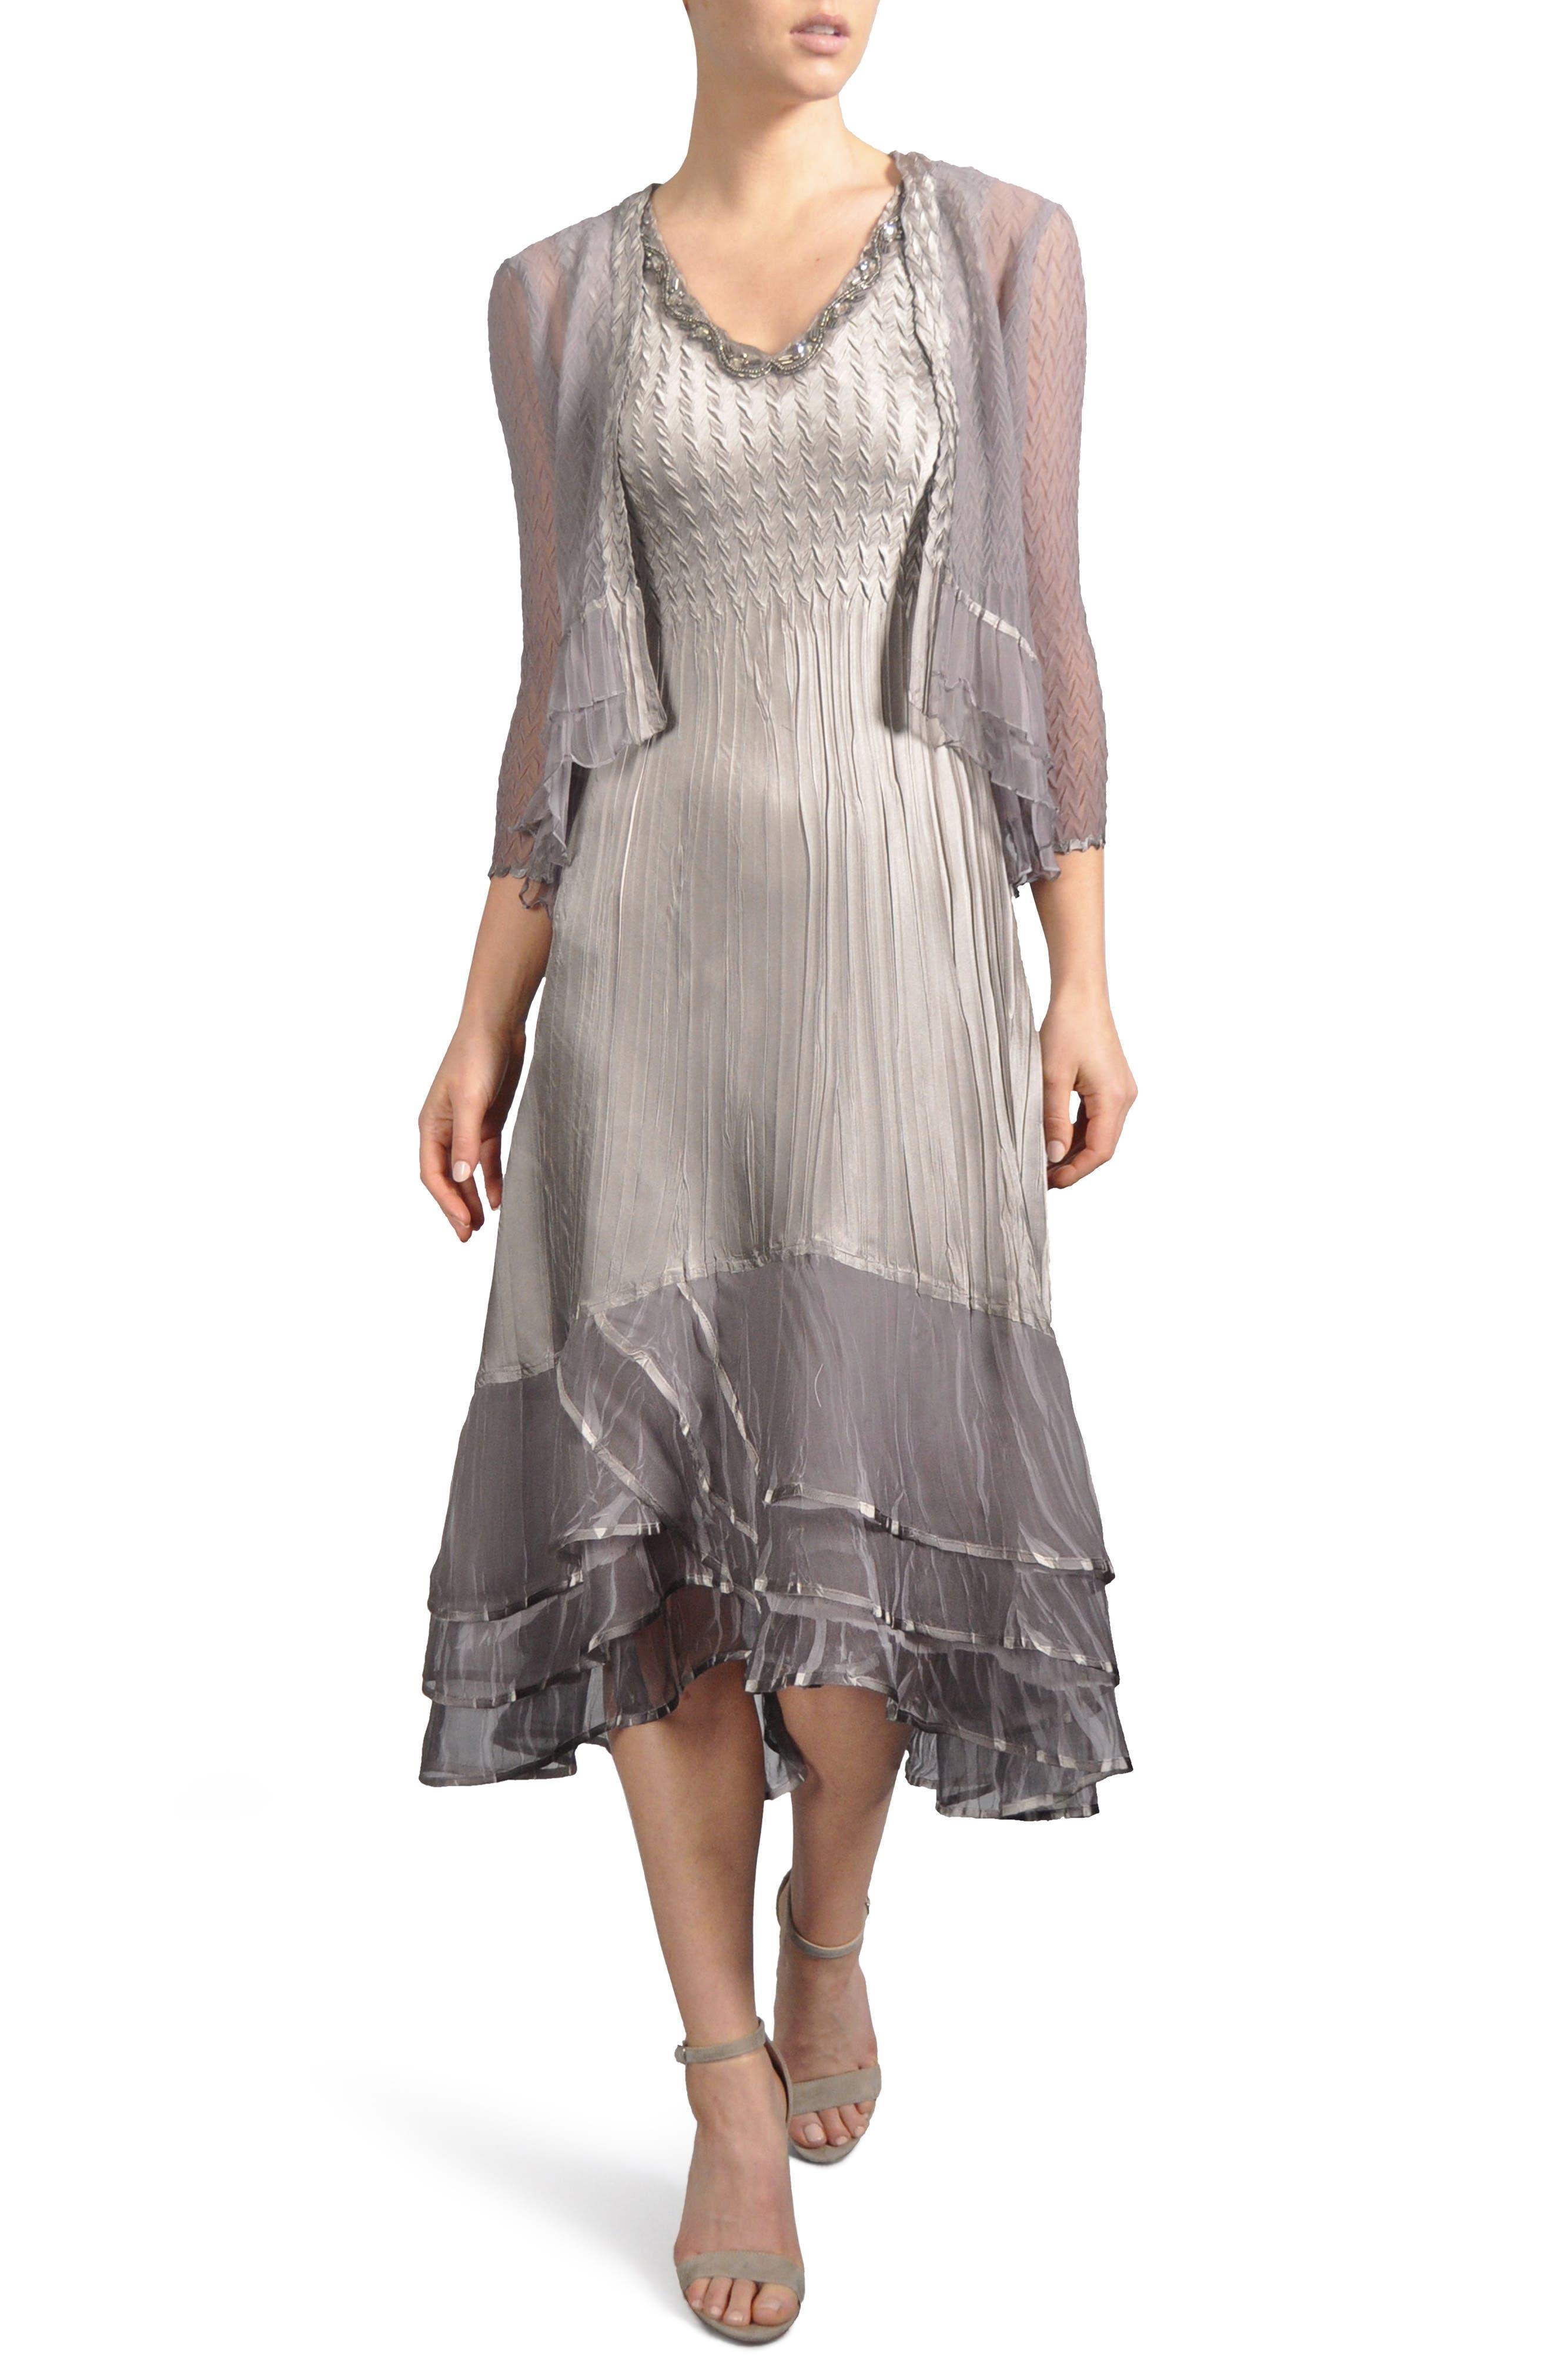 Main Image - Komarov Embellished Tiered Hem Dress With Jacket (Regular & Petite)